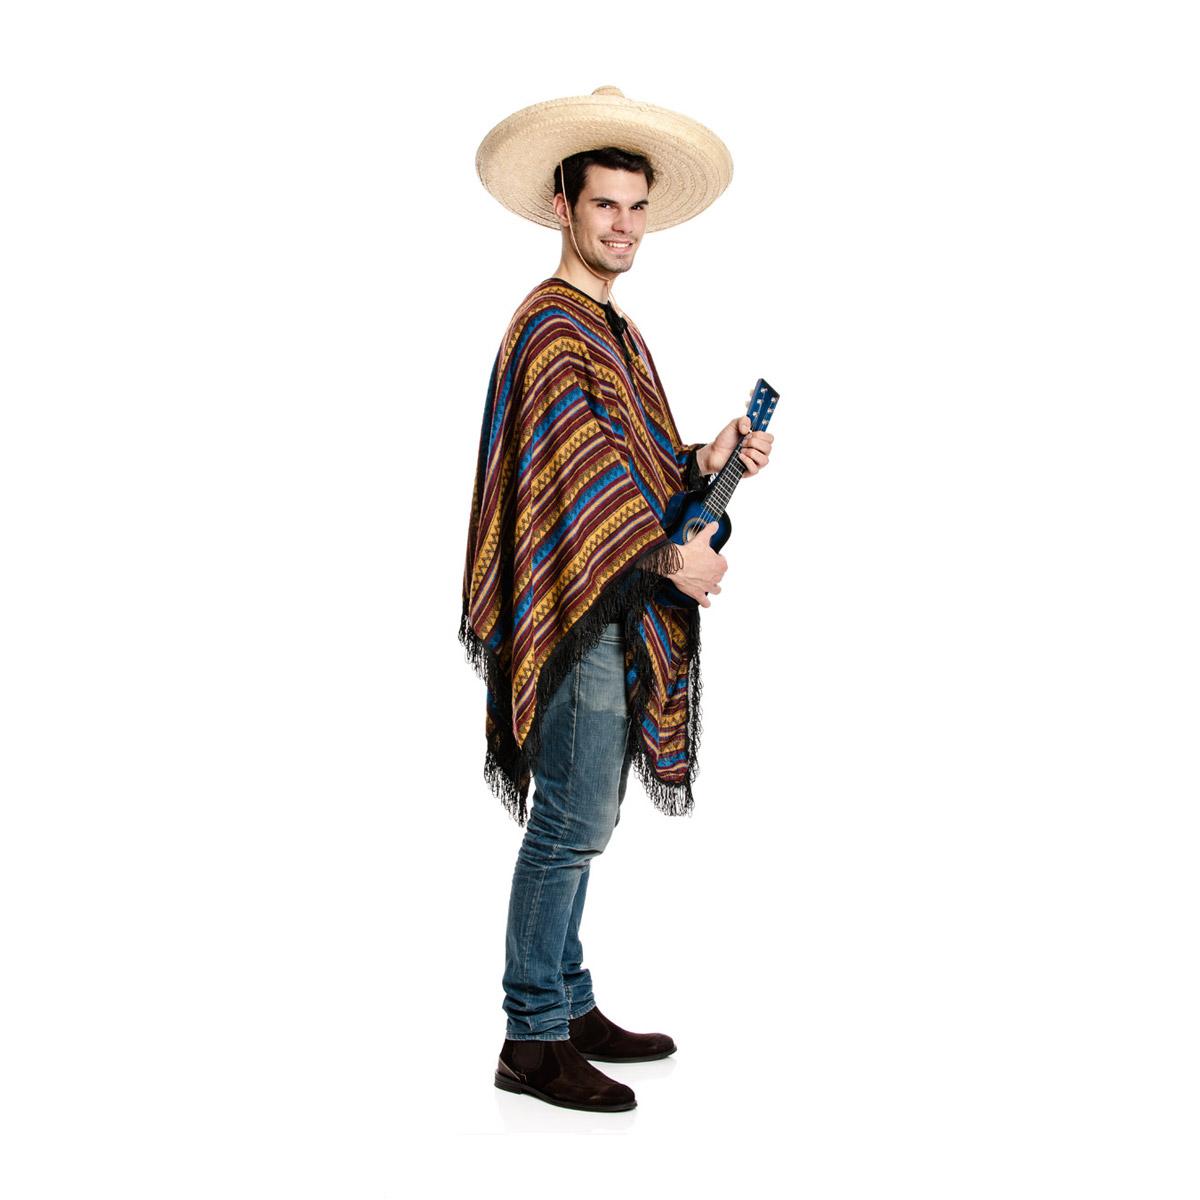 poncho mexikaner kost m herren bequem verkleidet kost mplanet. Black Bedroom Furniture Sets. Home Design Ideas